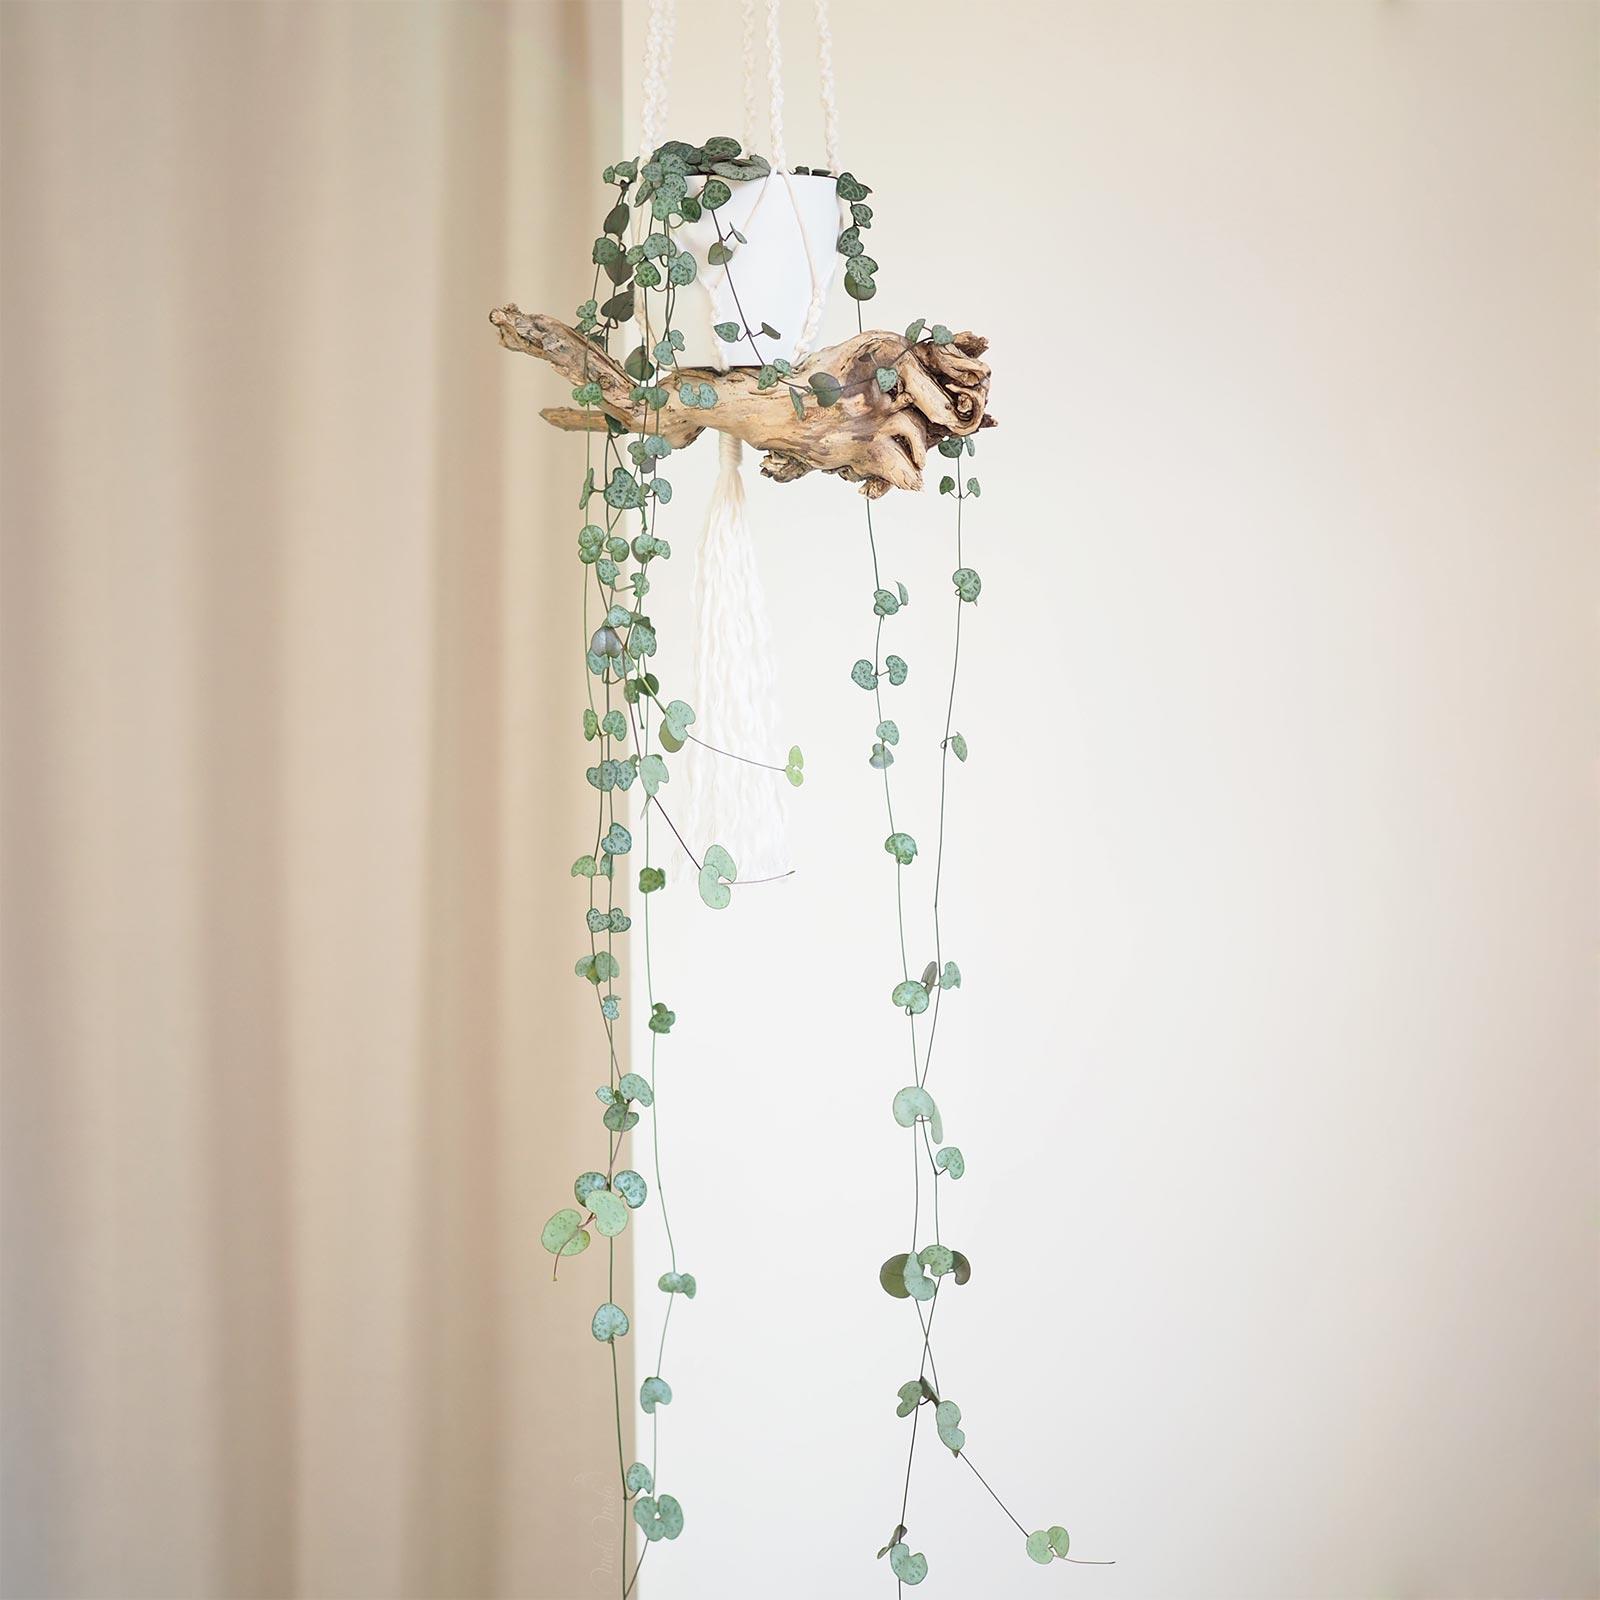 ceropegia woodii suspension macramé corde lin Belfast Linen Undyed Airedale Yarns racine bois laboutiquedemelimelo